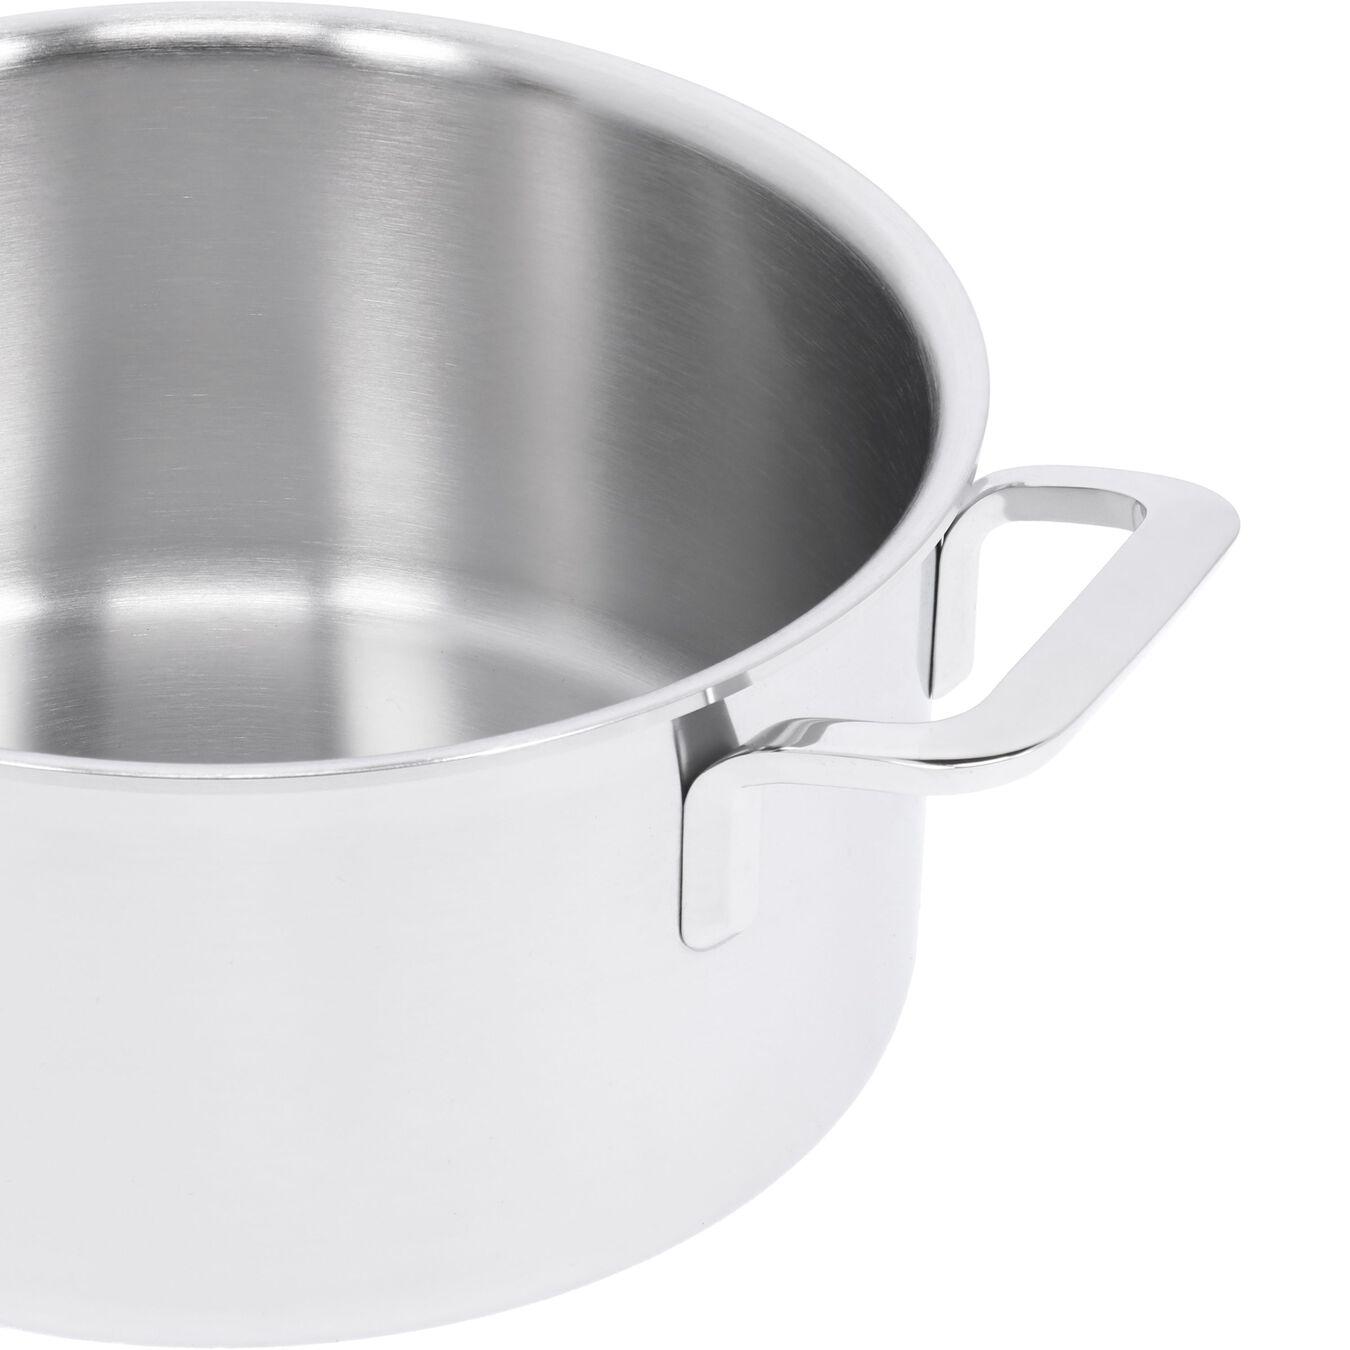 Kookpot met dubbelwandig deksel, 22 cm / 4 l,,large 4